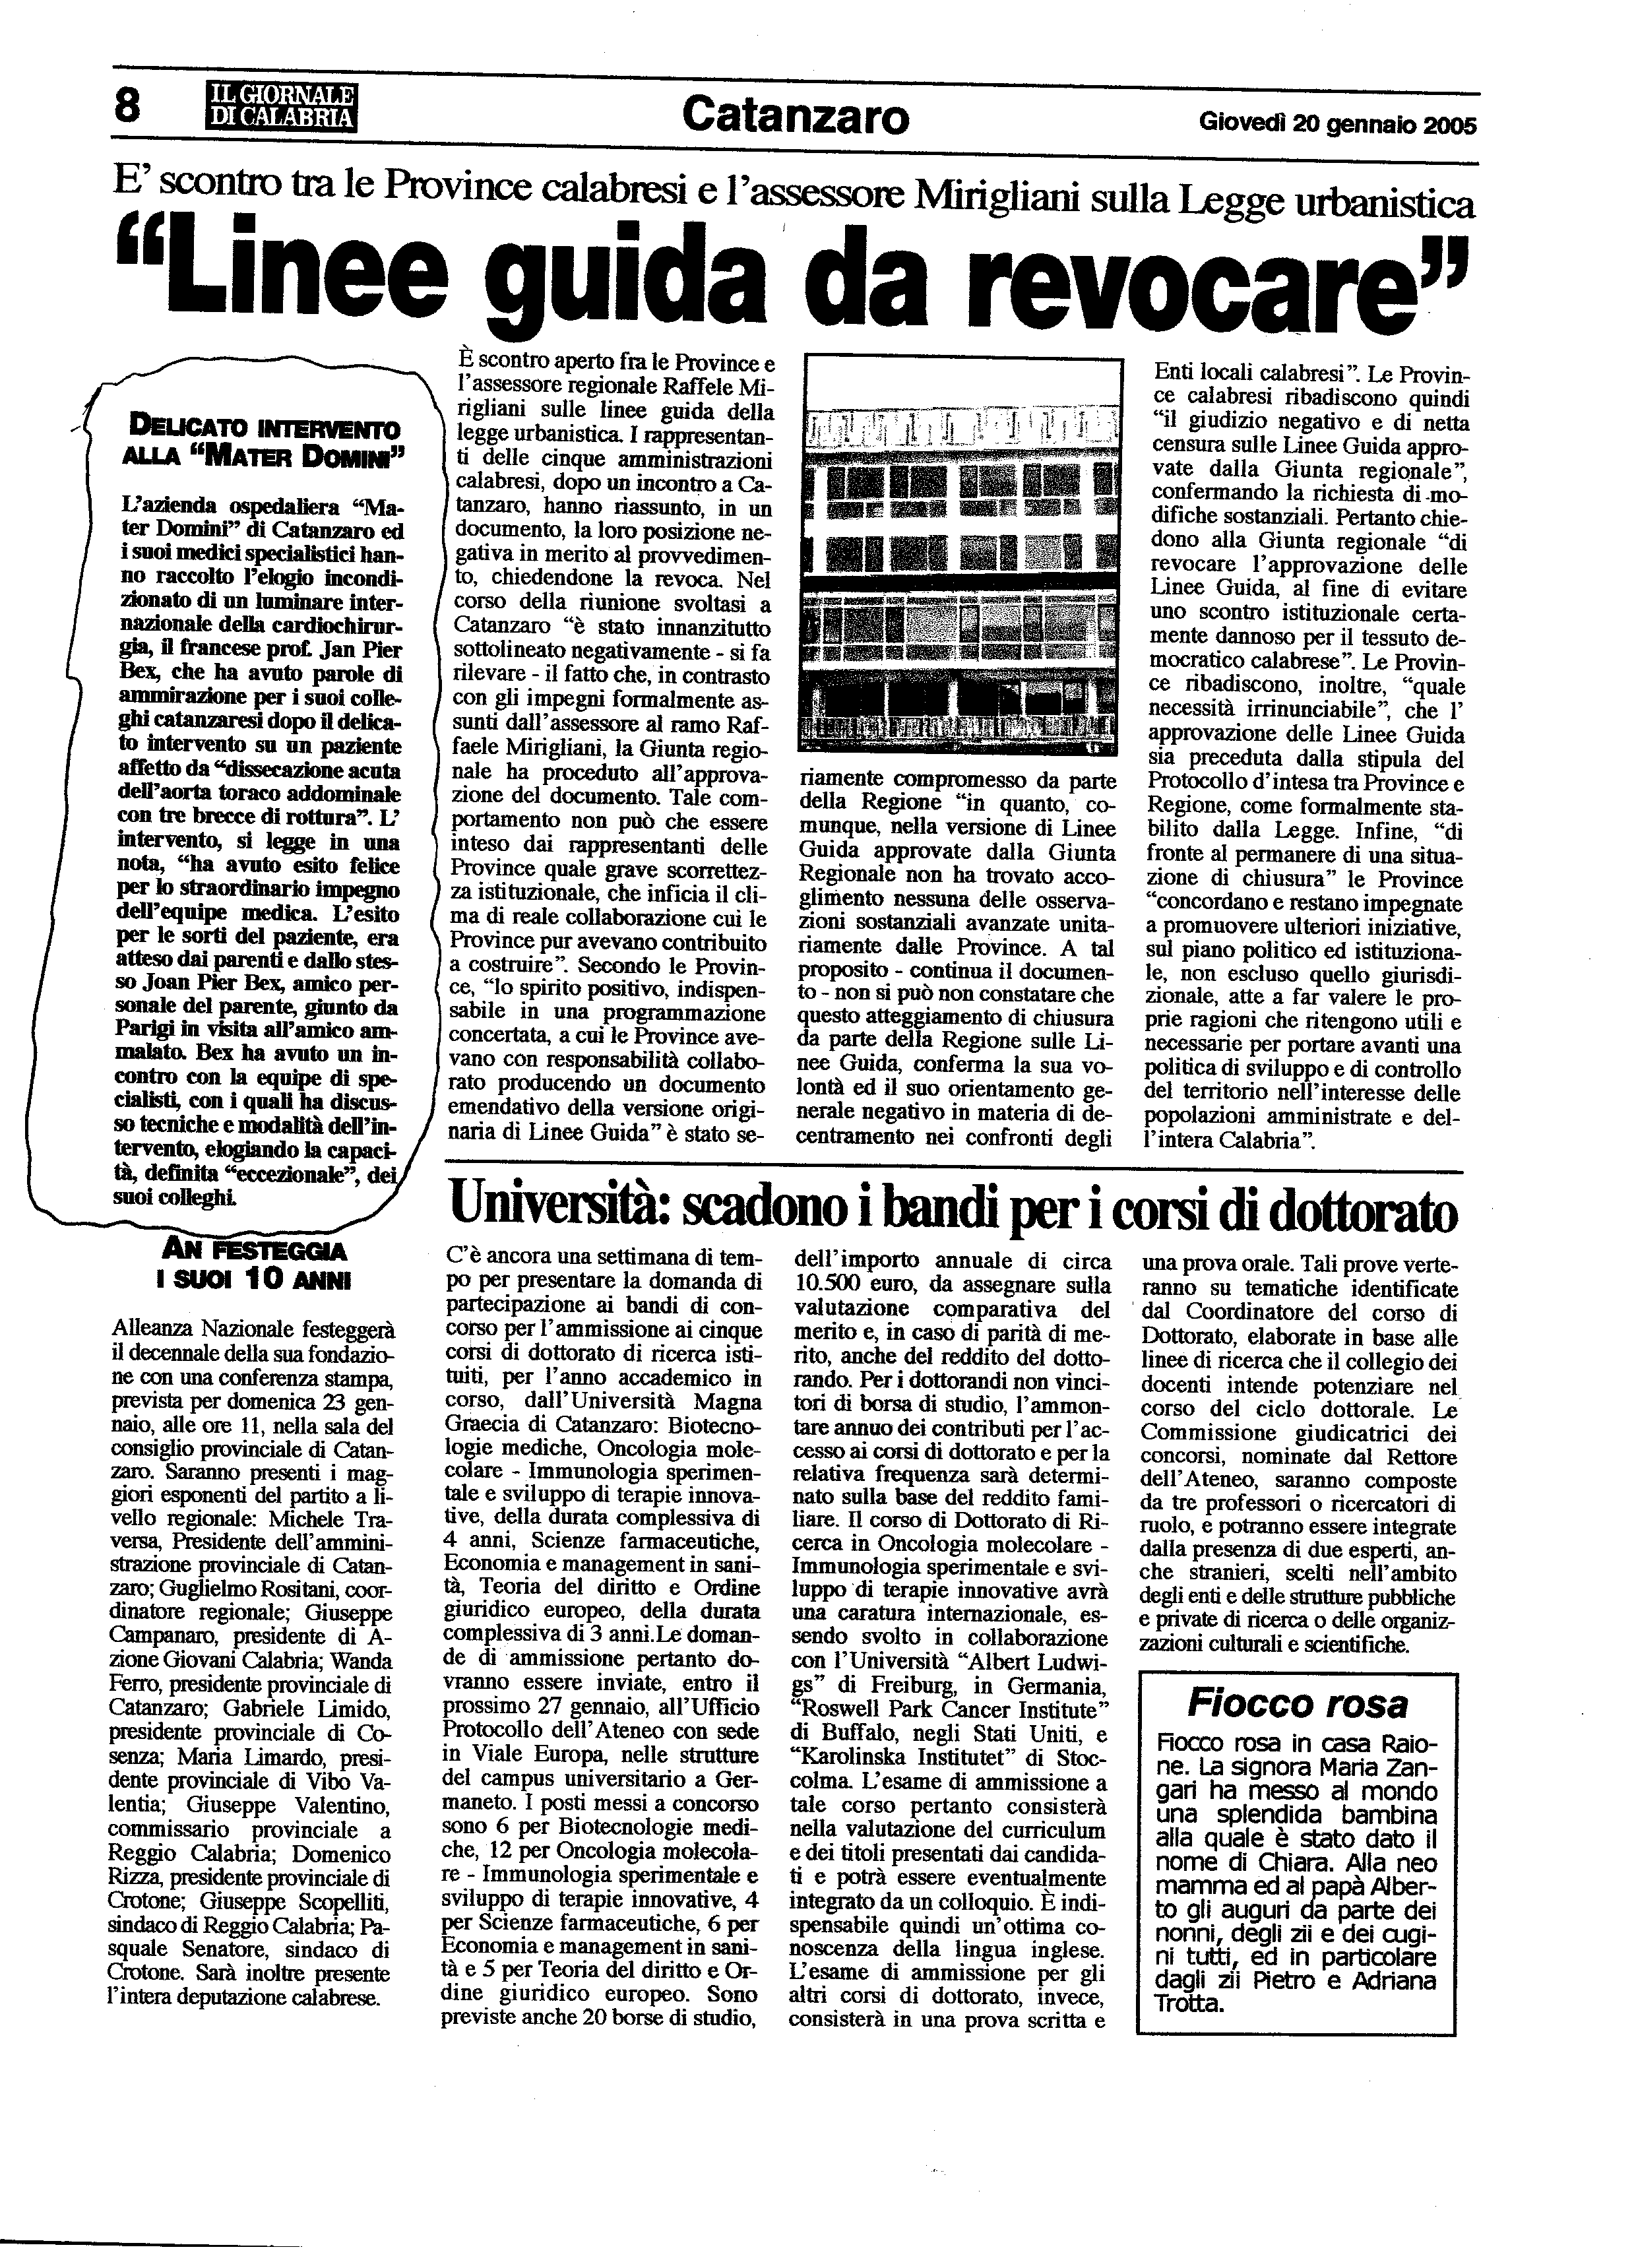 calabria-gazzetta-2005_pagina_1